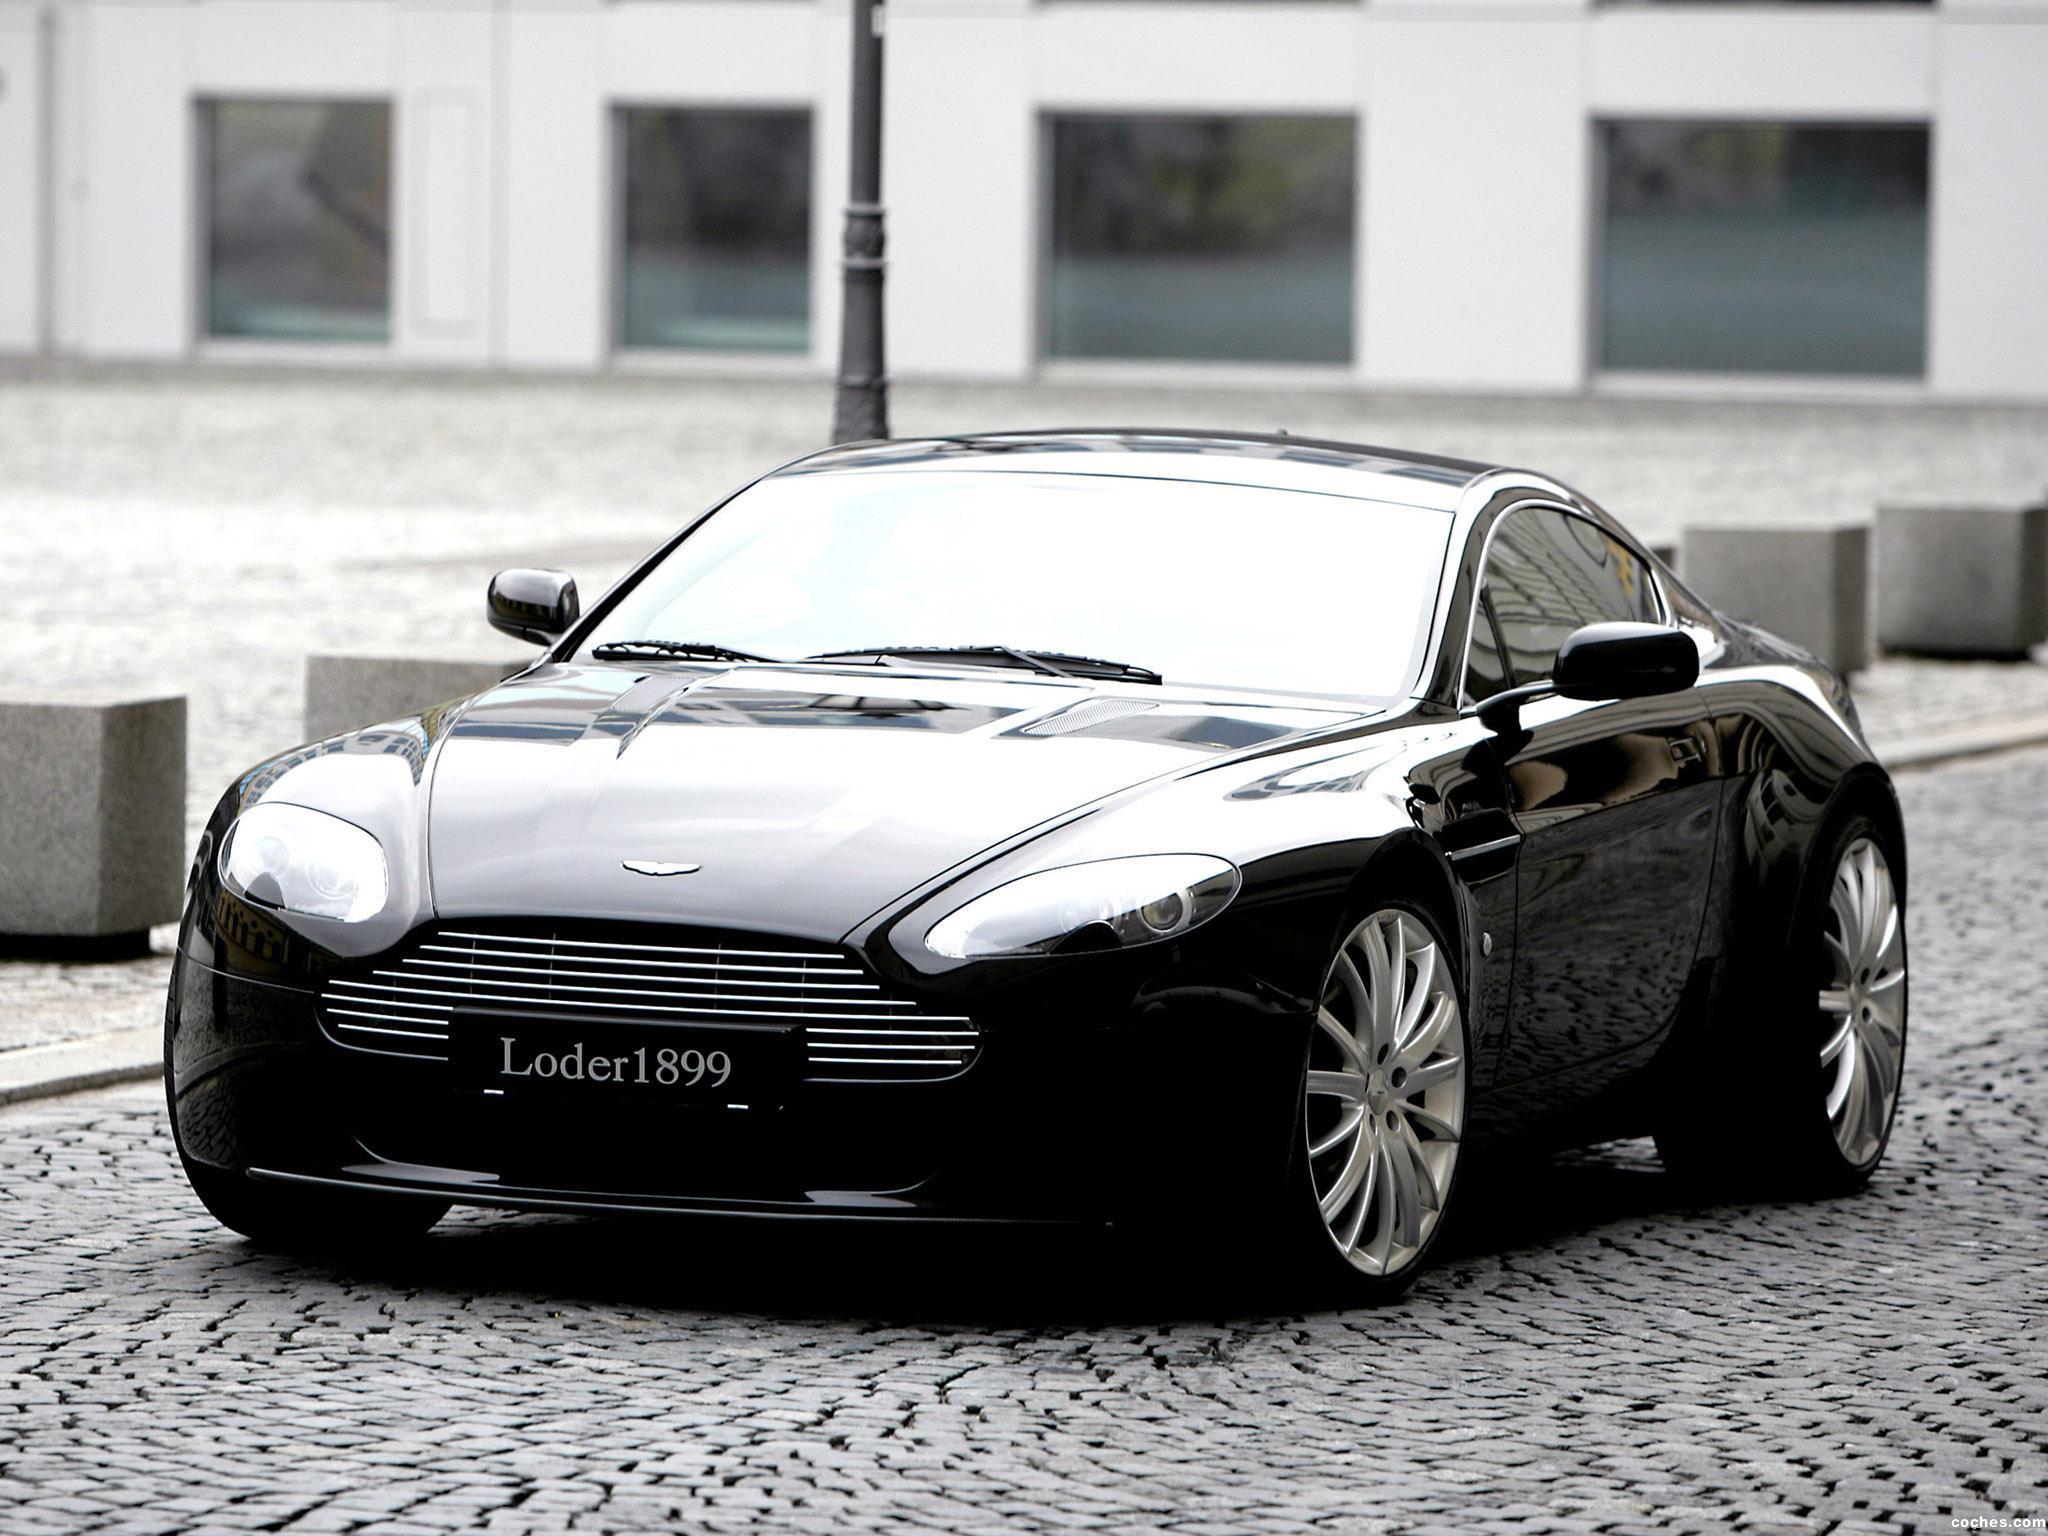 Foto 0 de Loder1899 Aston Martin V8 Vantage 2007